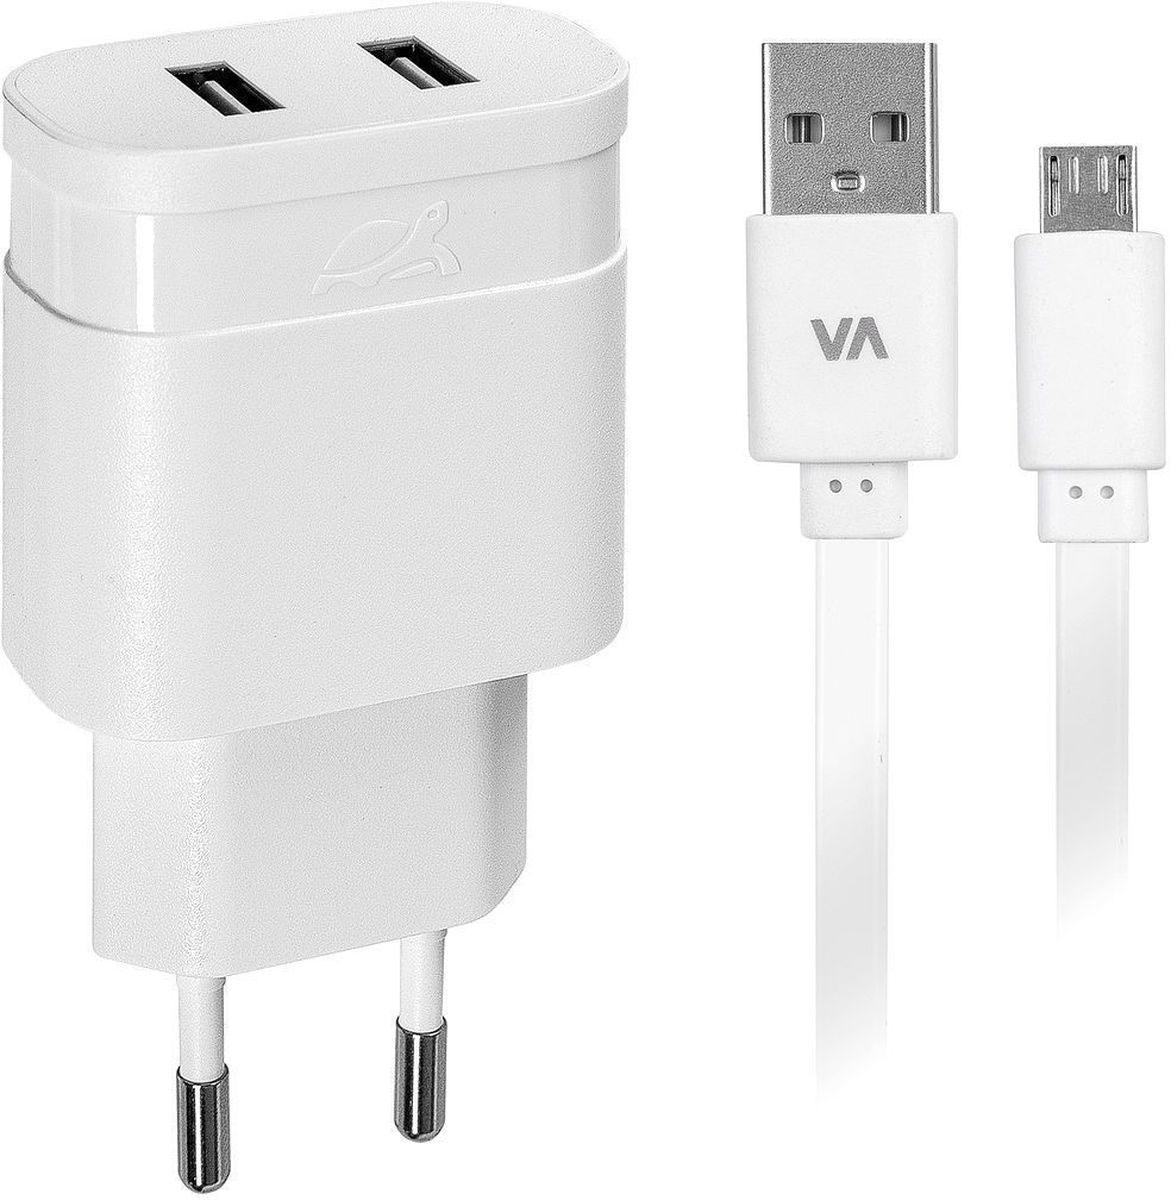 Rivapower VA4122 WD1, White сетевое зарядное устройство